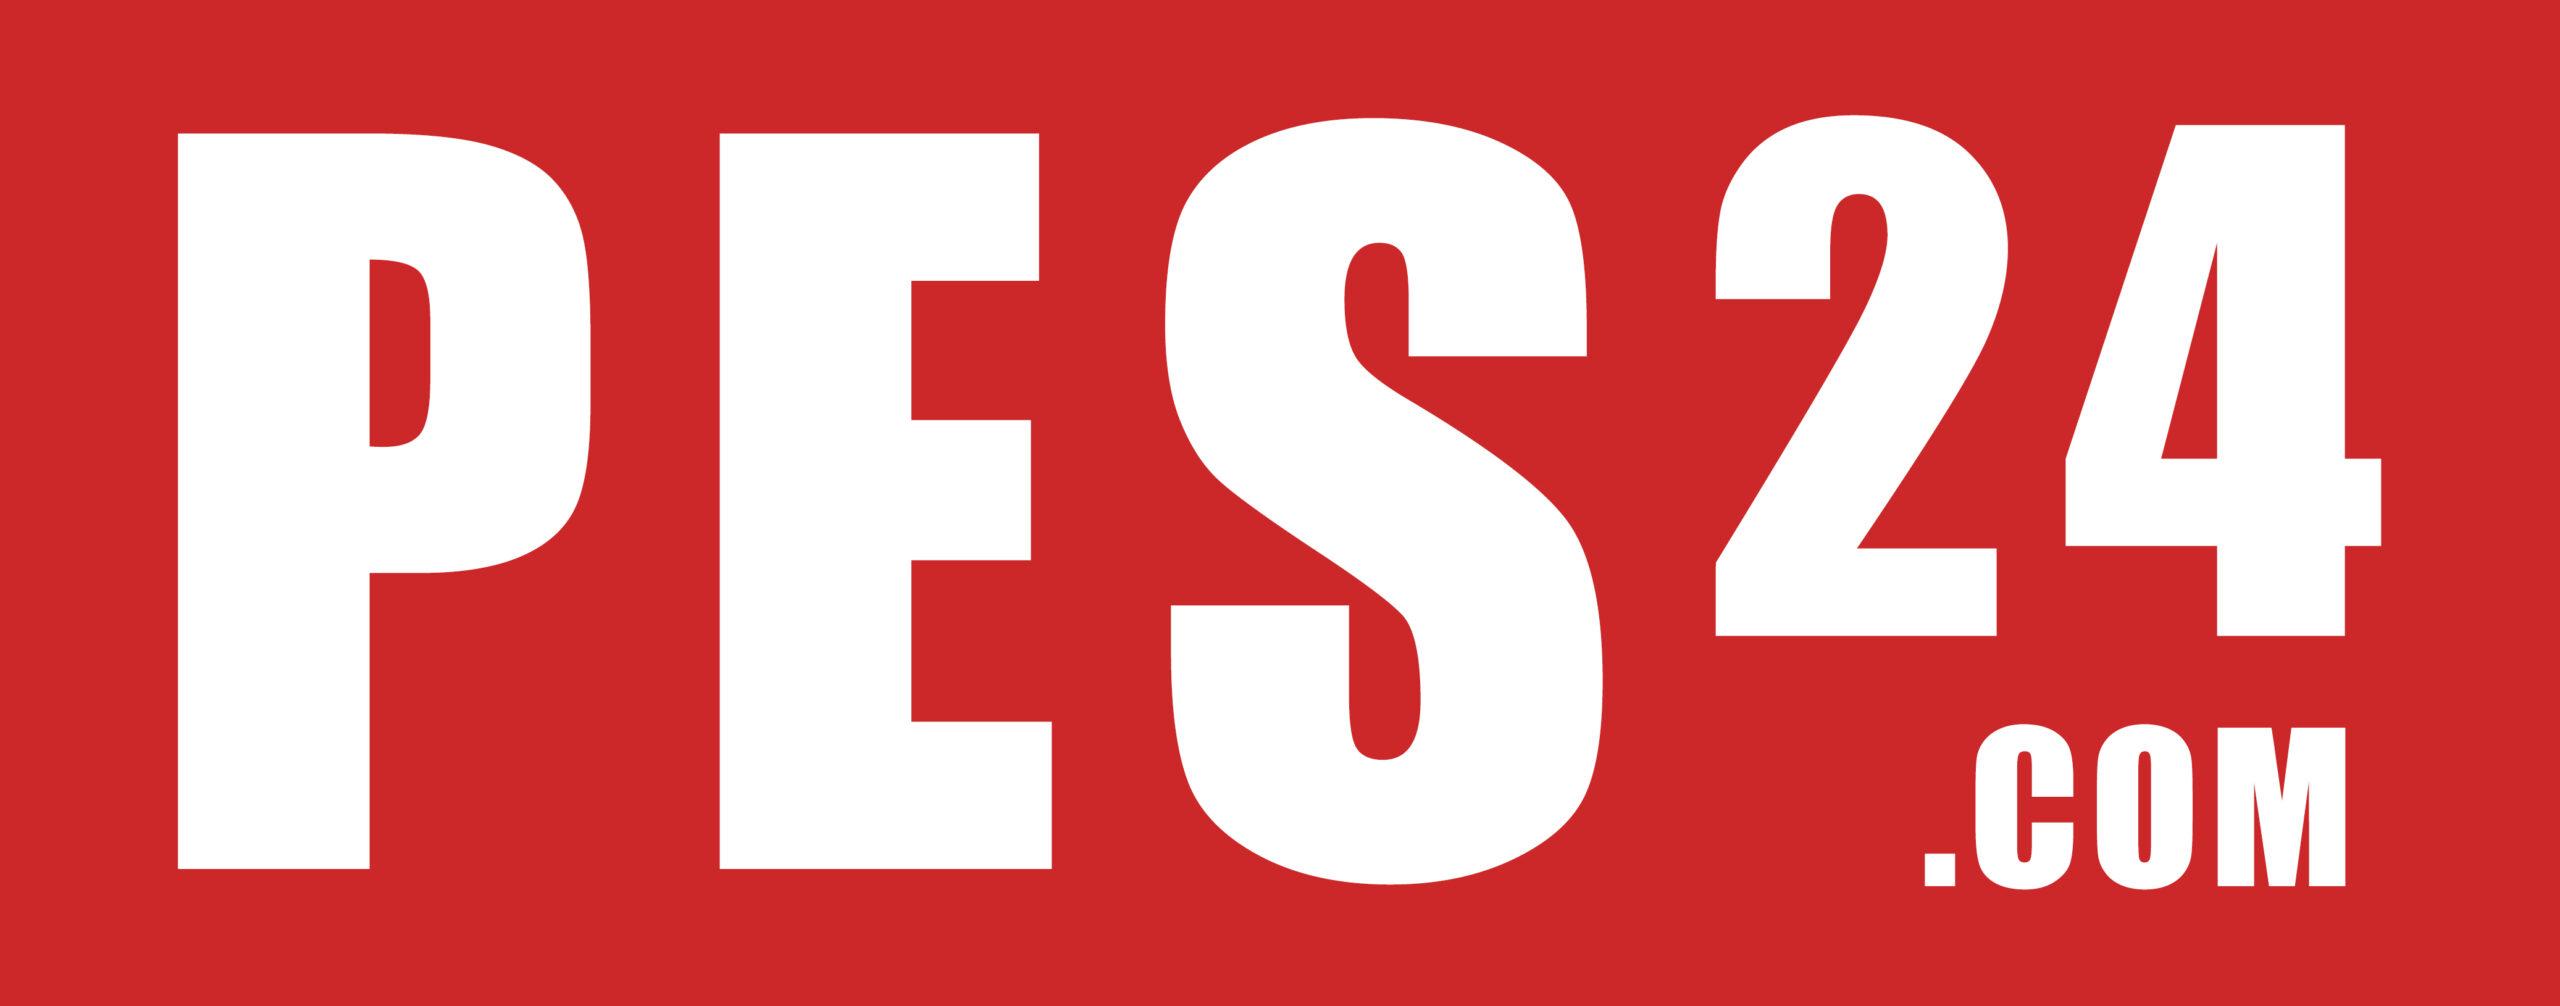 Pes24